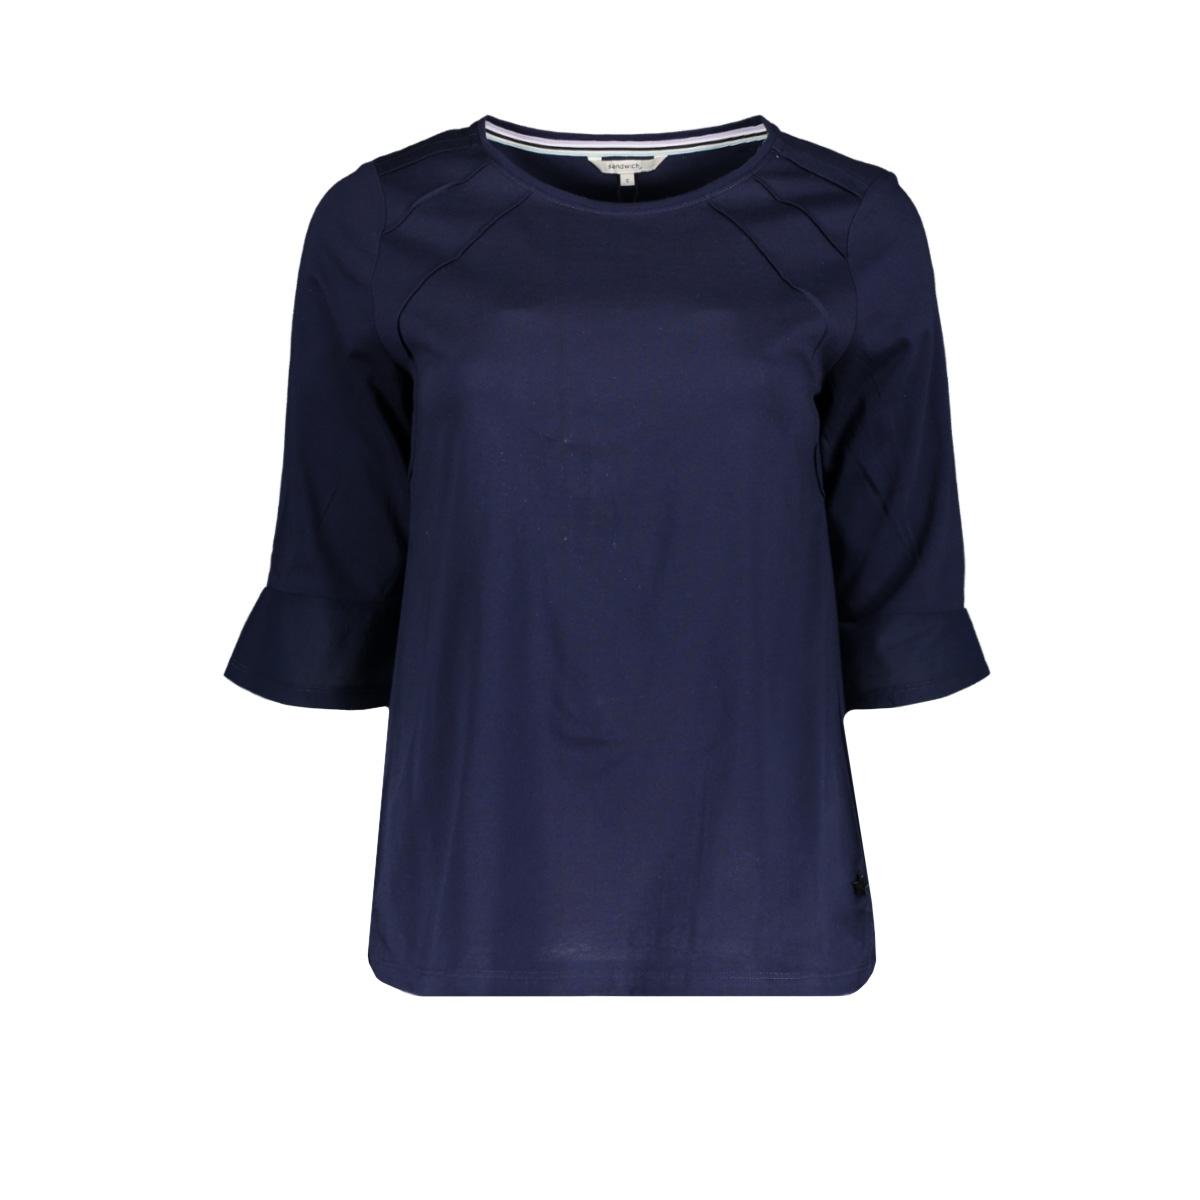 top met gestikt plisse achterkant 21101643 sandwich t-shirt 40151